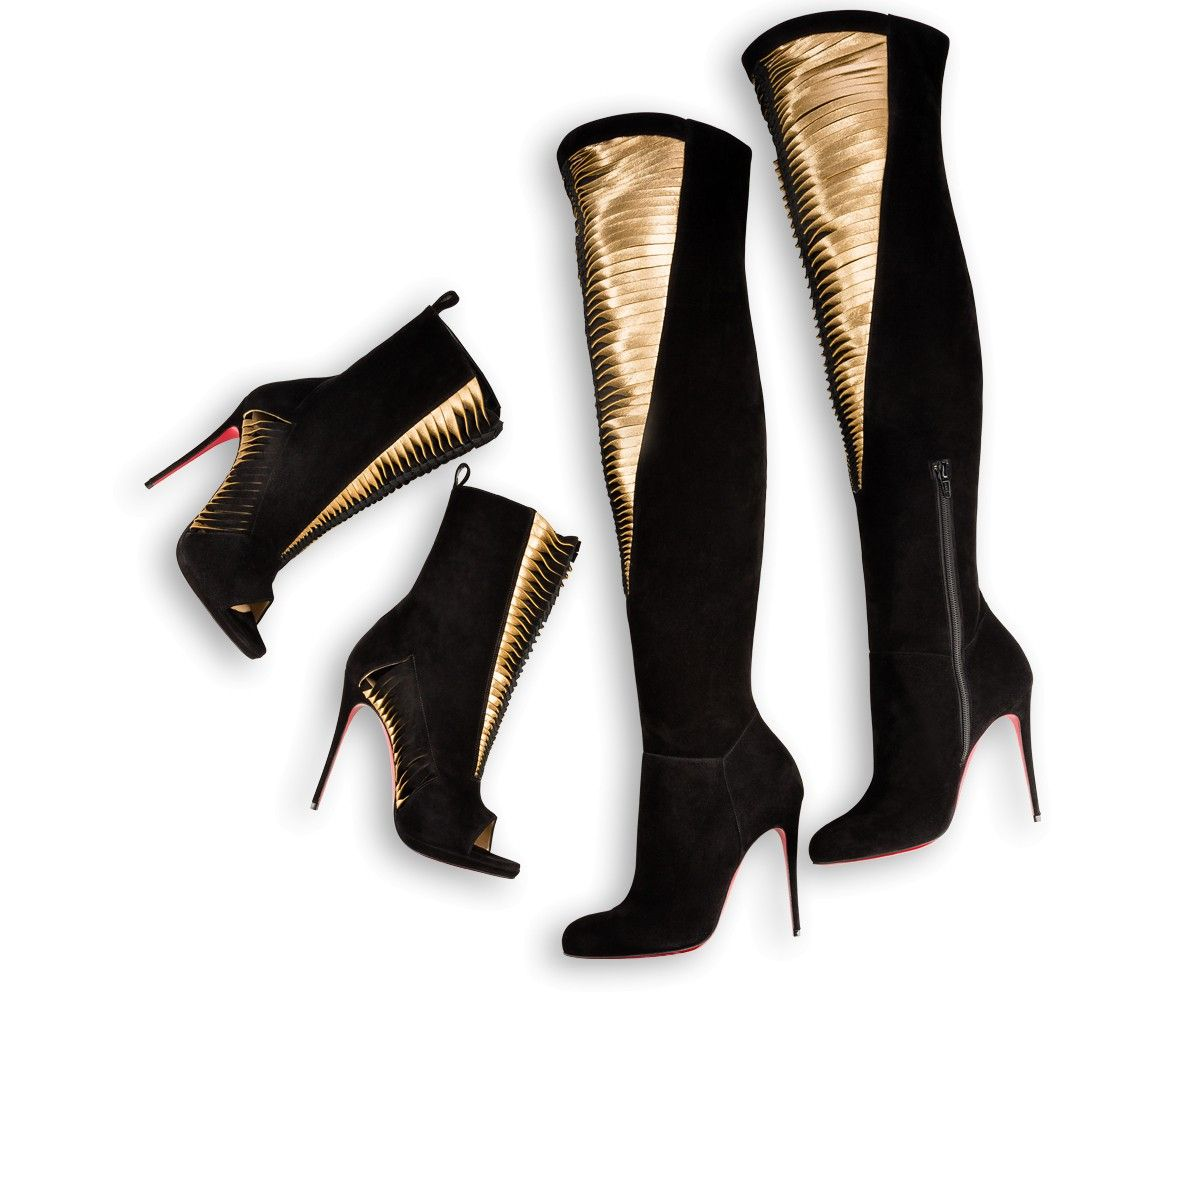 f69bc2da8874 SIEGFRIDALTA VEAU VELOURS 100 Black Mekong Veau velours - Women Shoes…